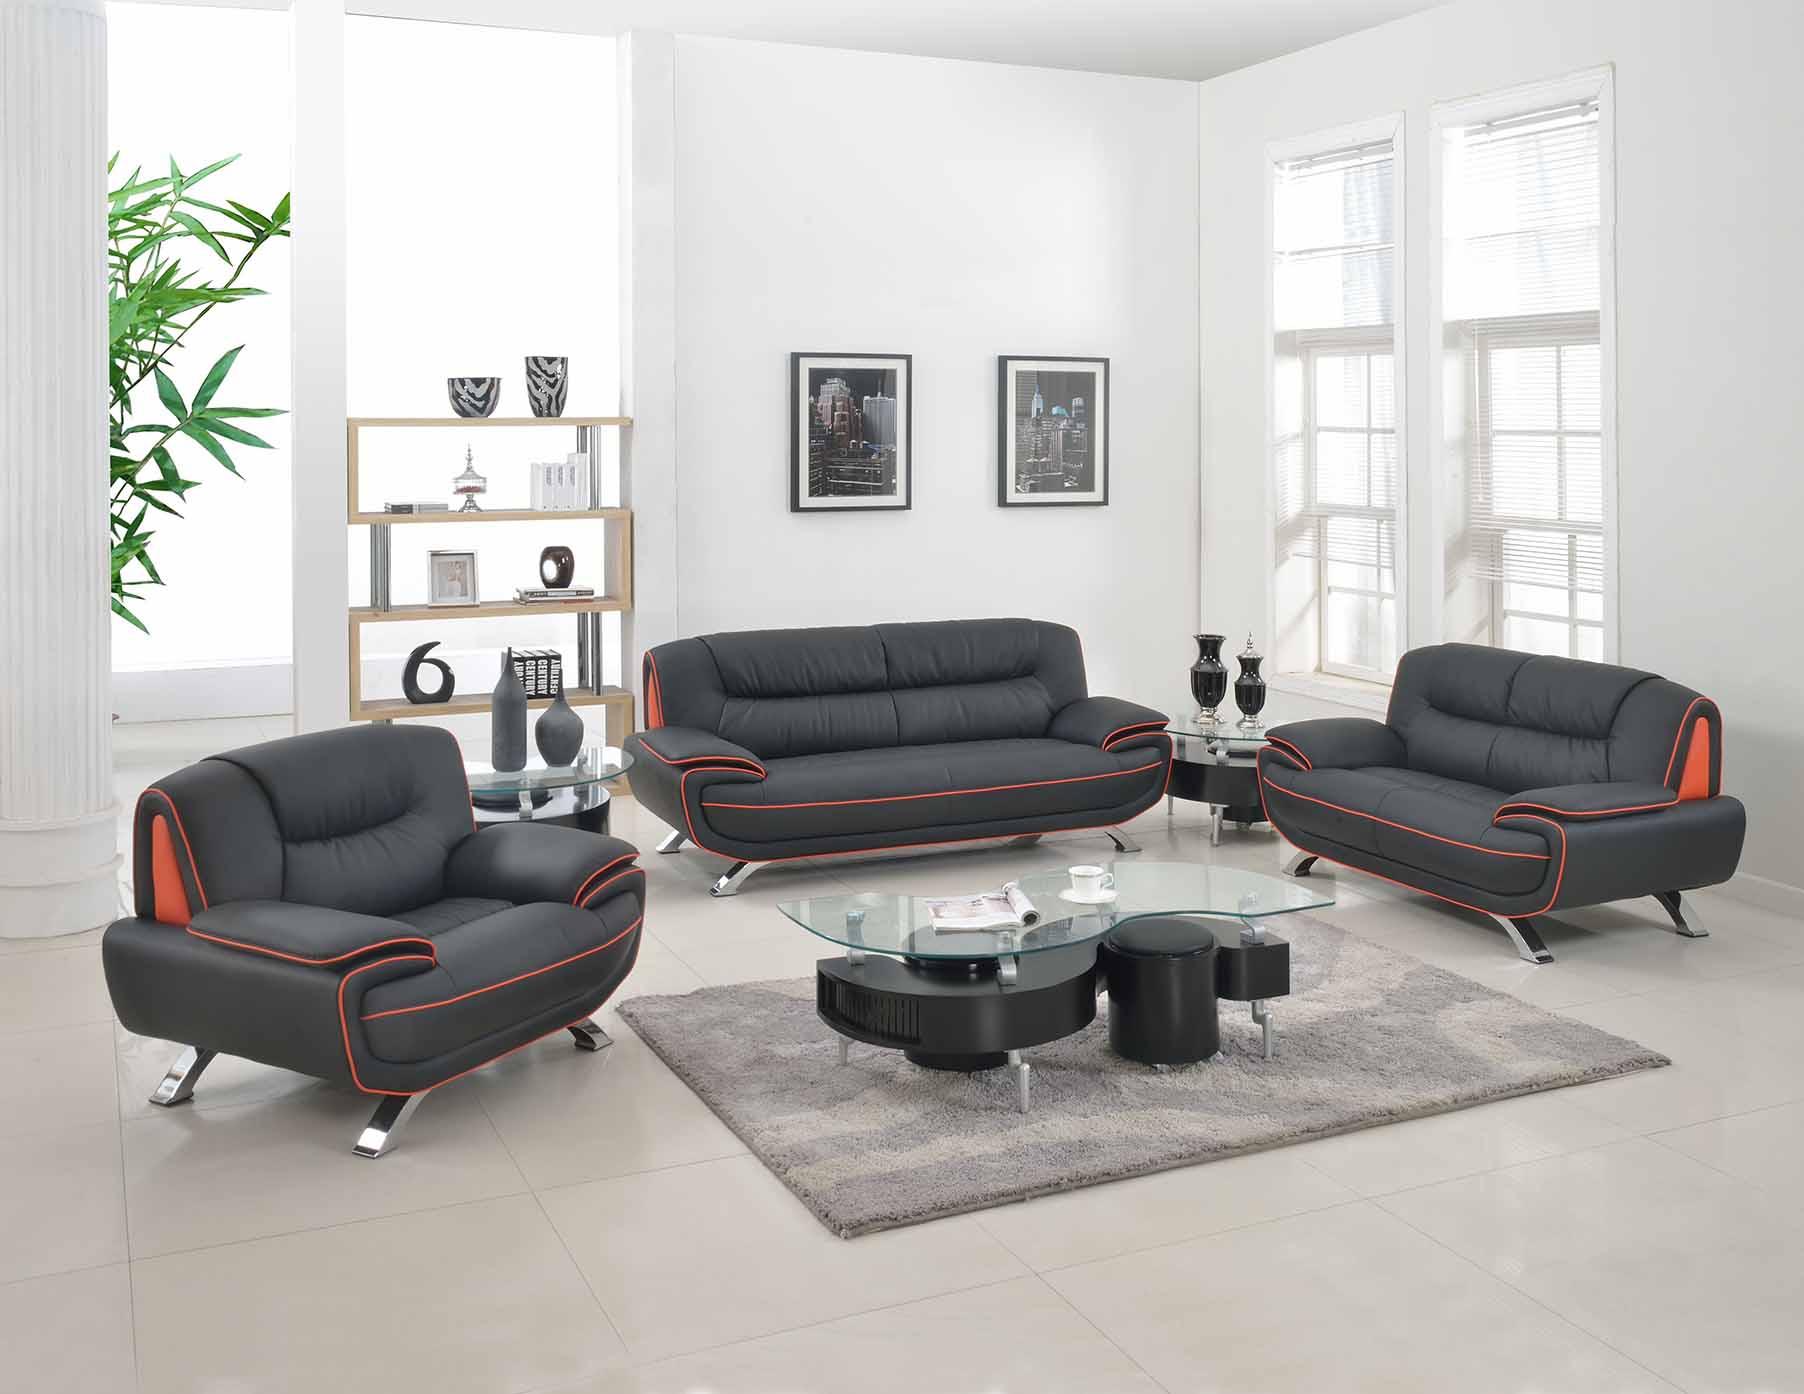 Black Red Genuine Leather Living Room Gu405 Casye Furniturecasye Furniture